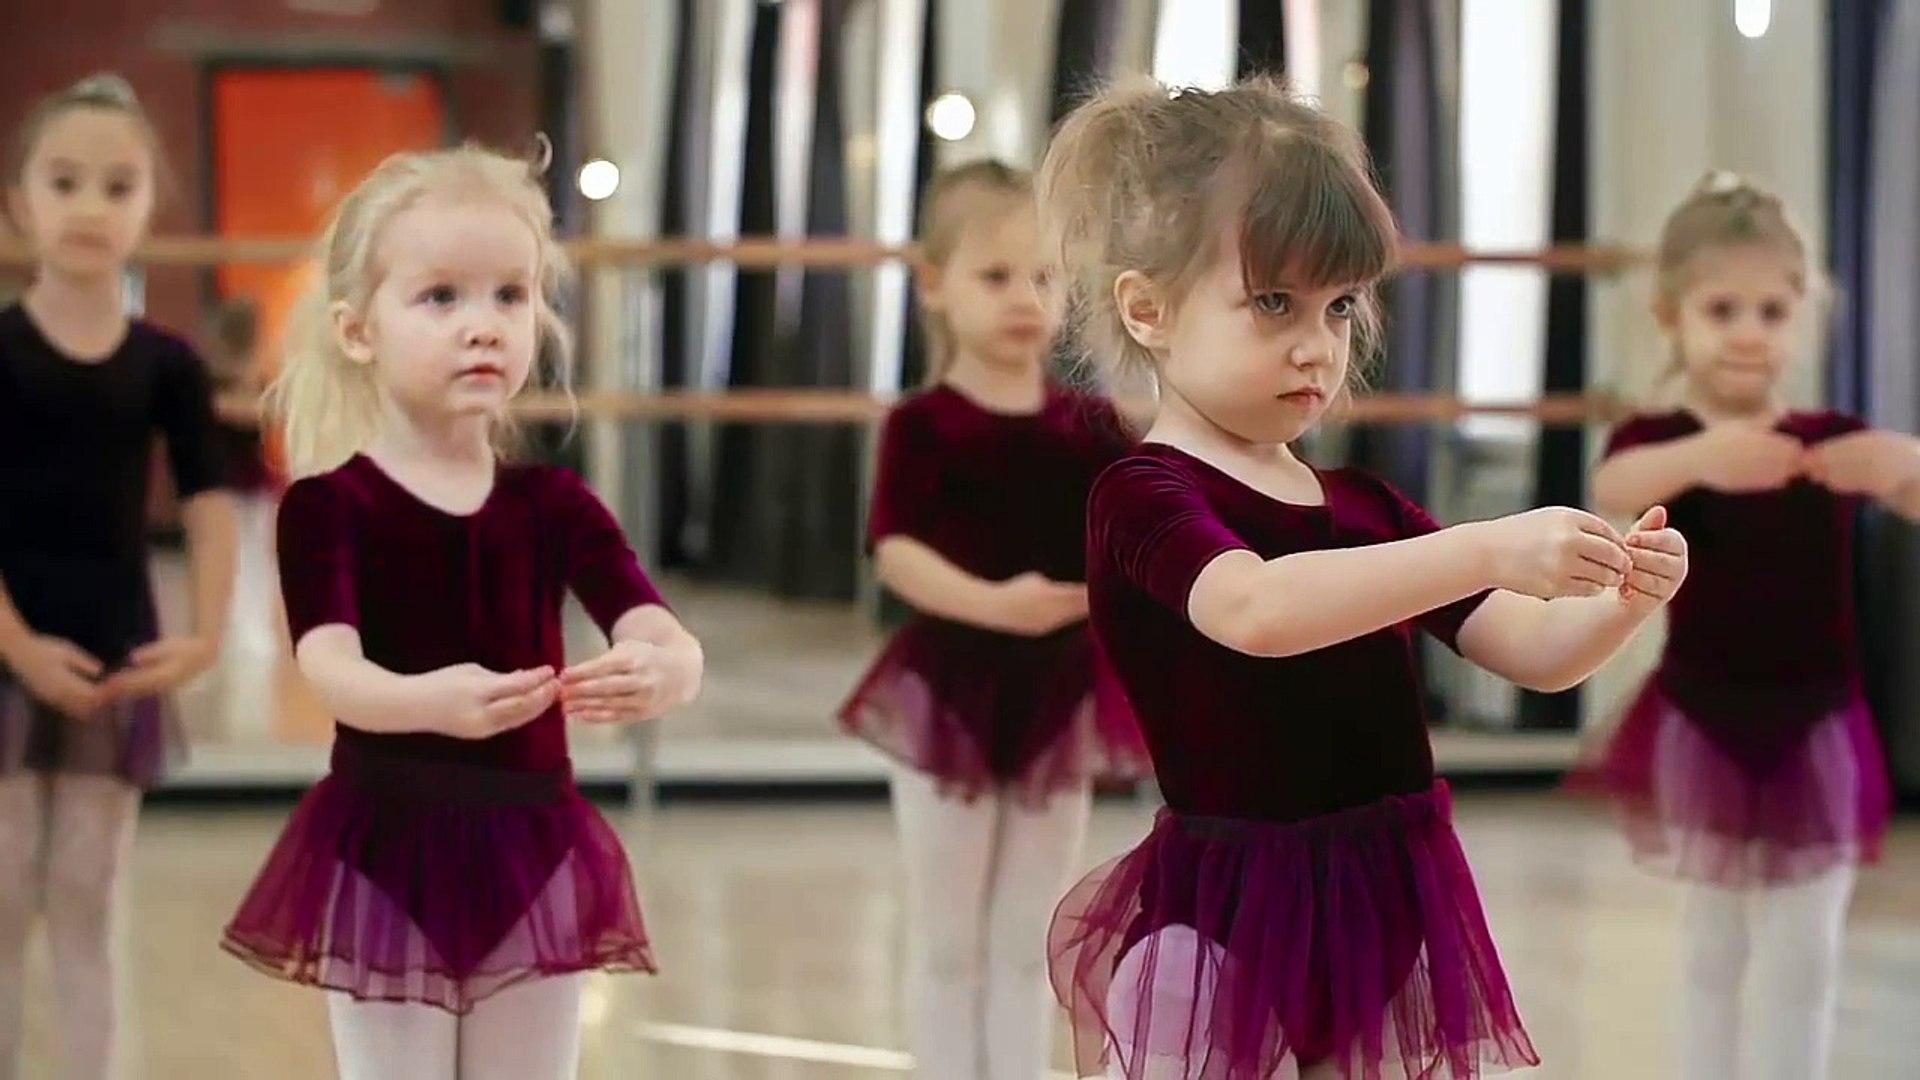 Ballet School Ballet classes for toddlers, ballet classes for kids, dance lessons